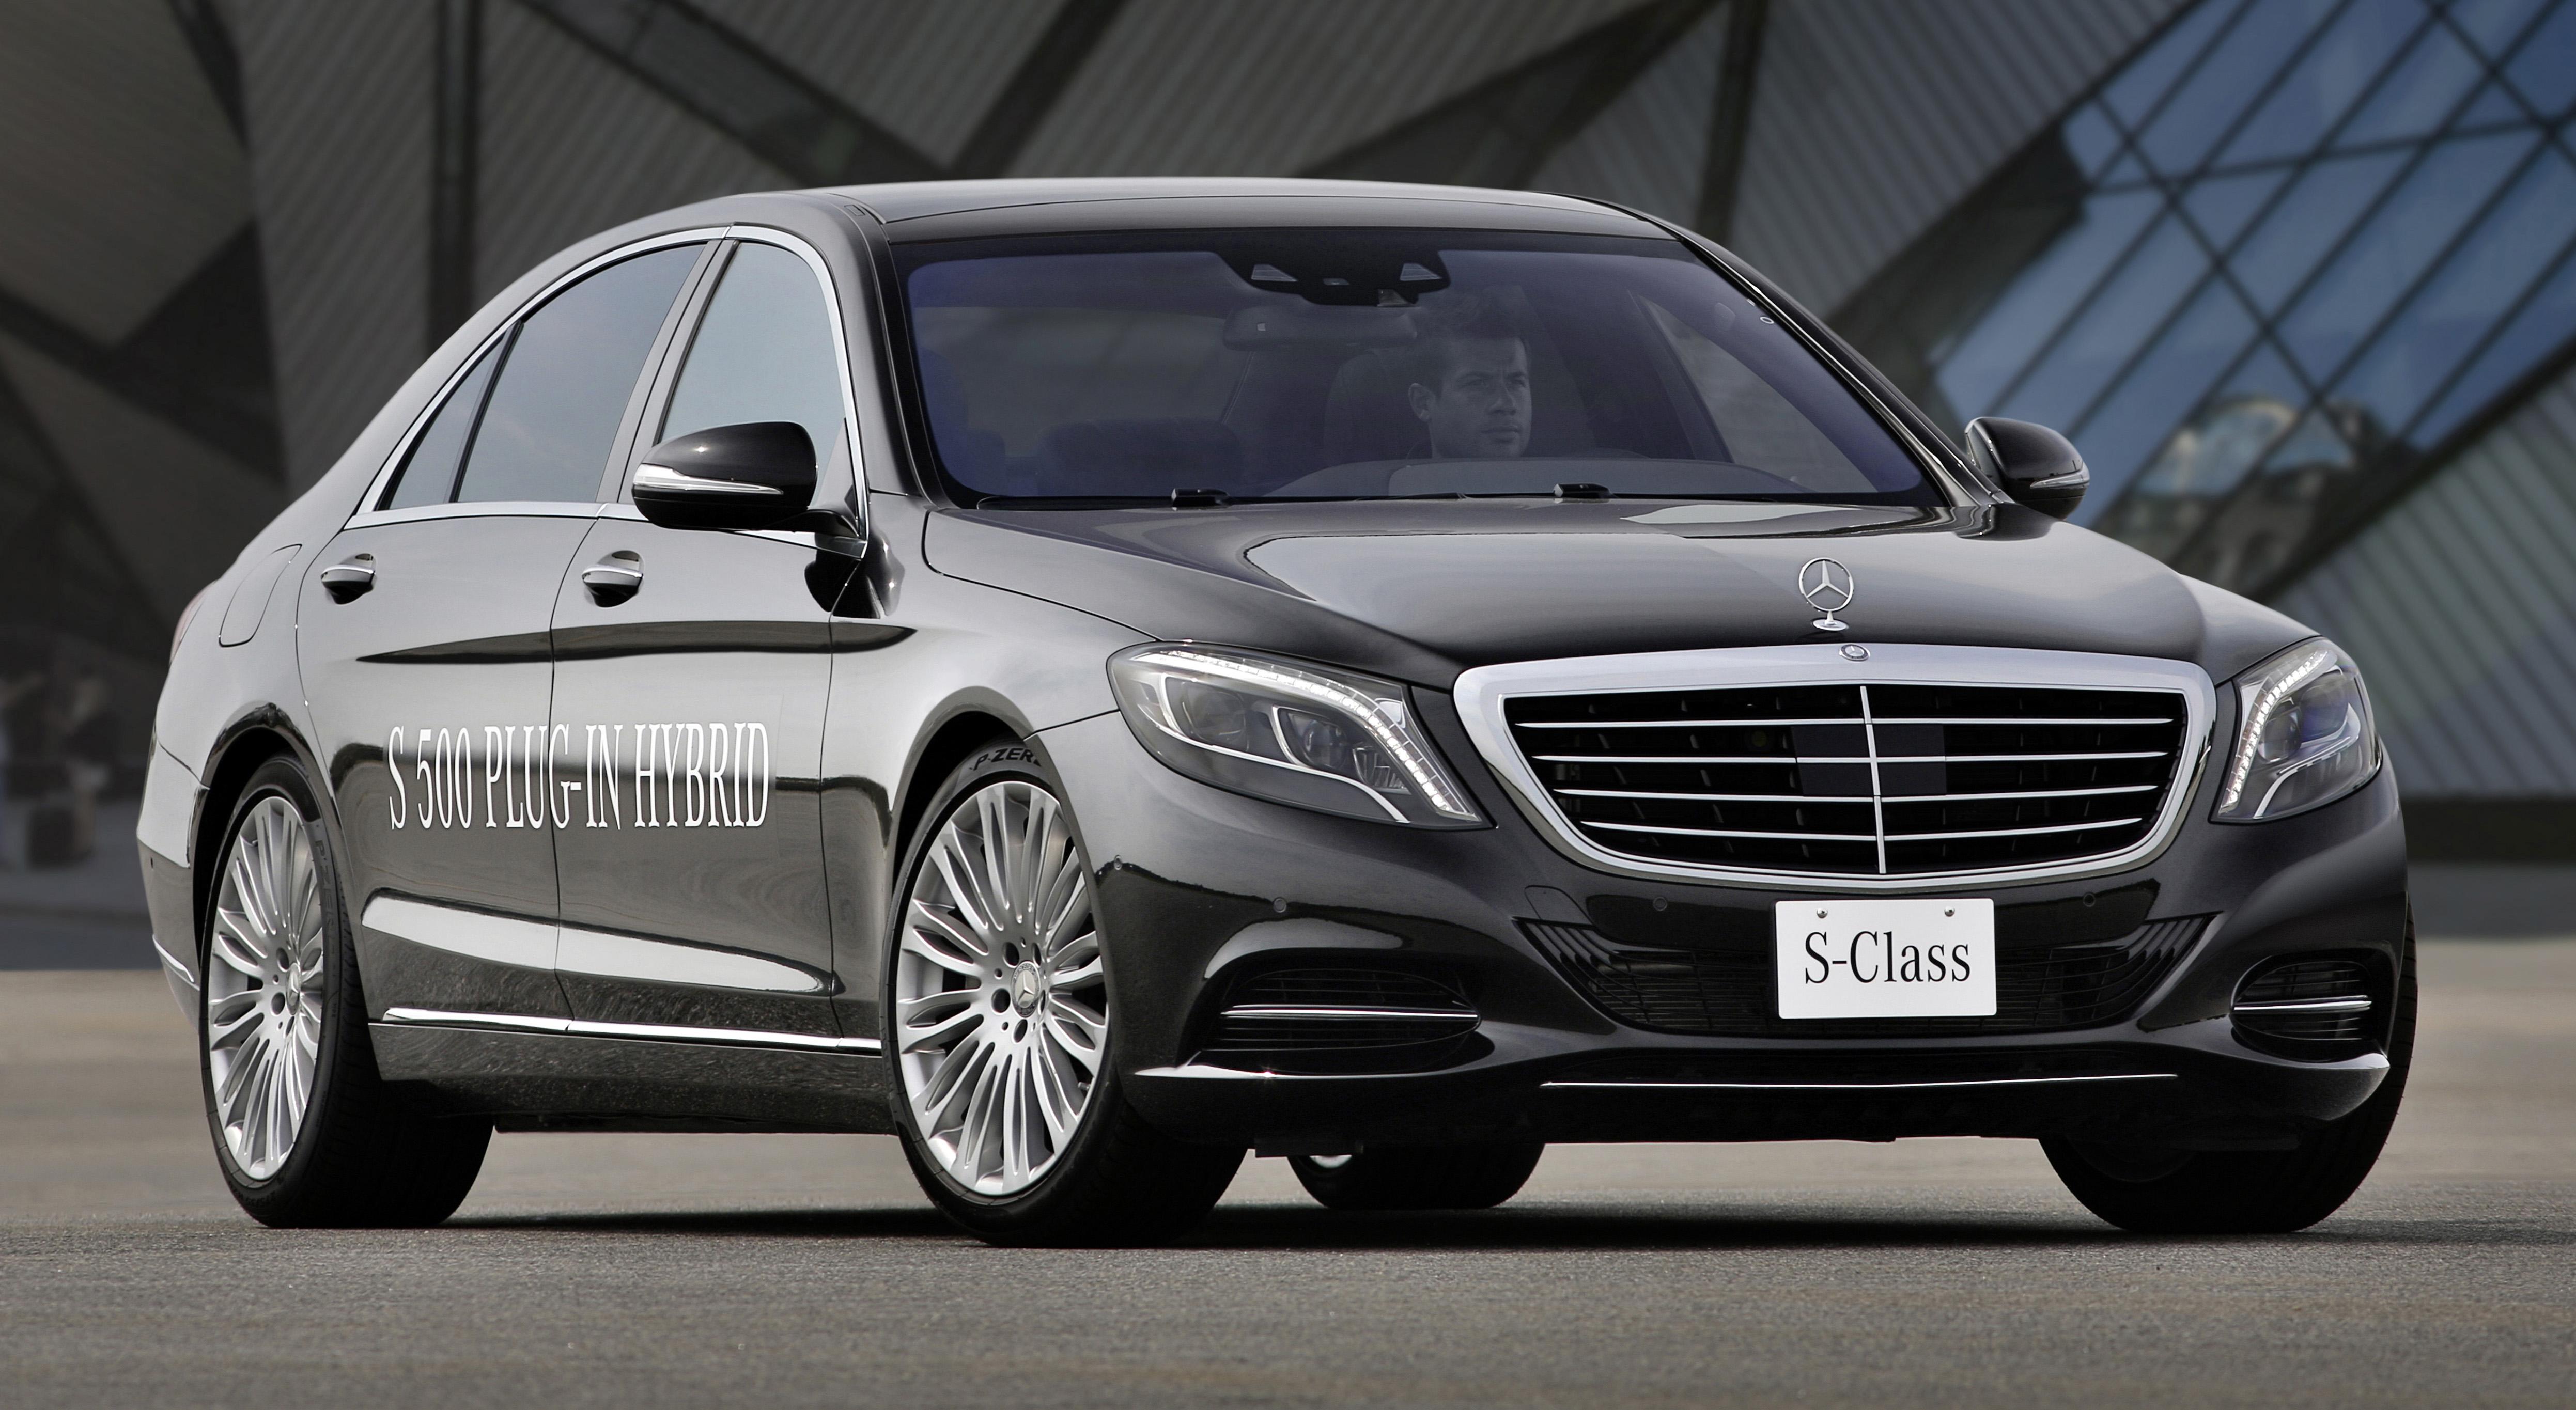 W222 Mercedes Benz S 500 Plug In Hybrid to debut at Frankfurt 2013 –